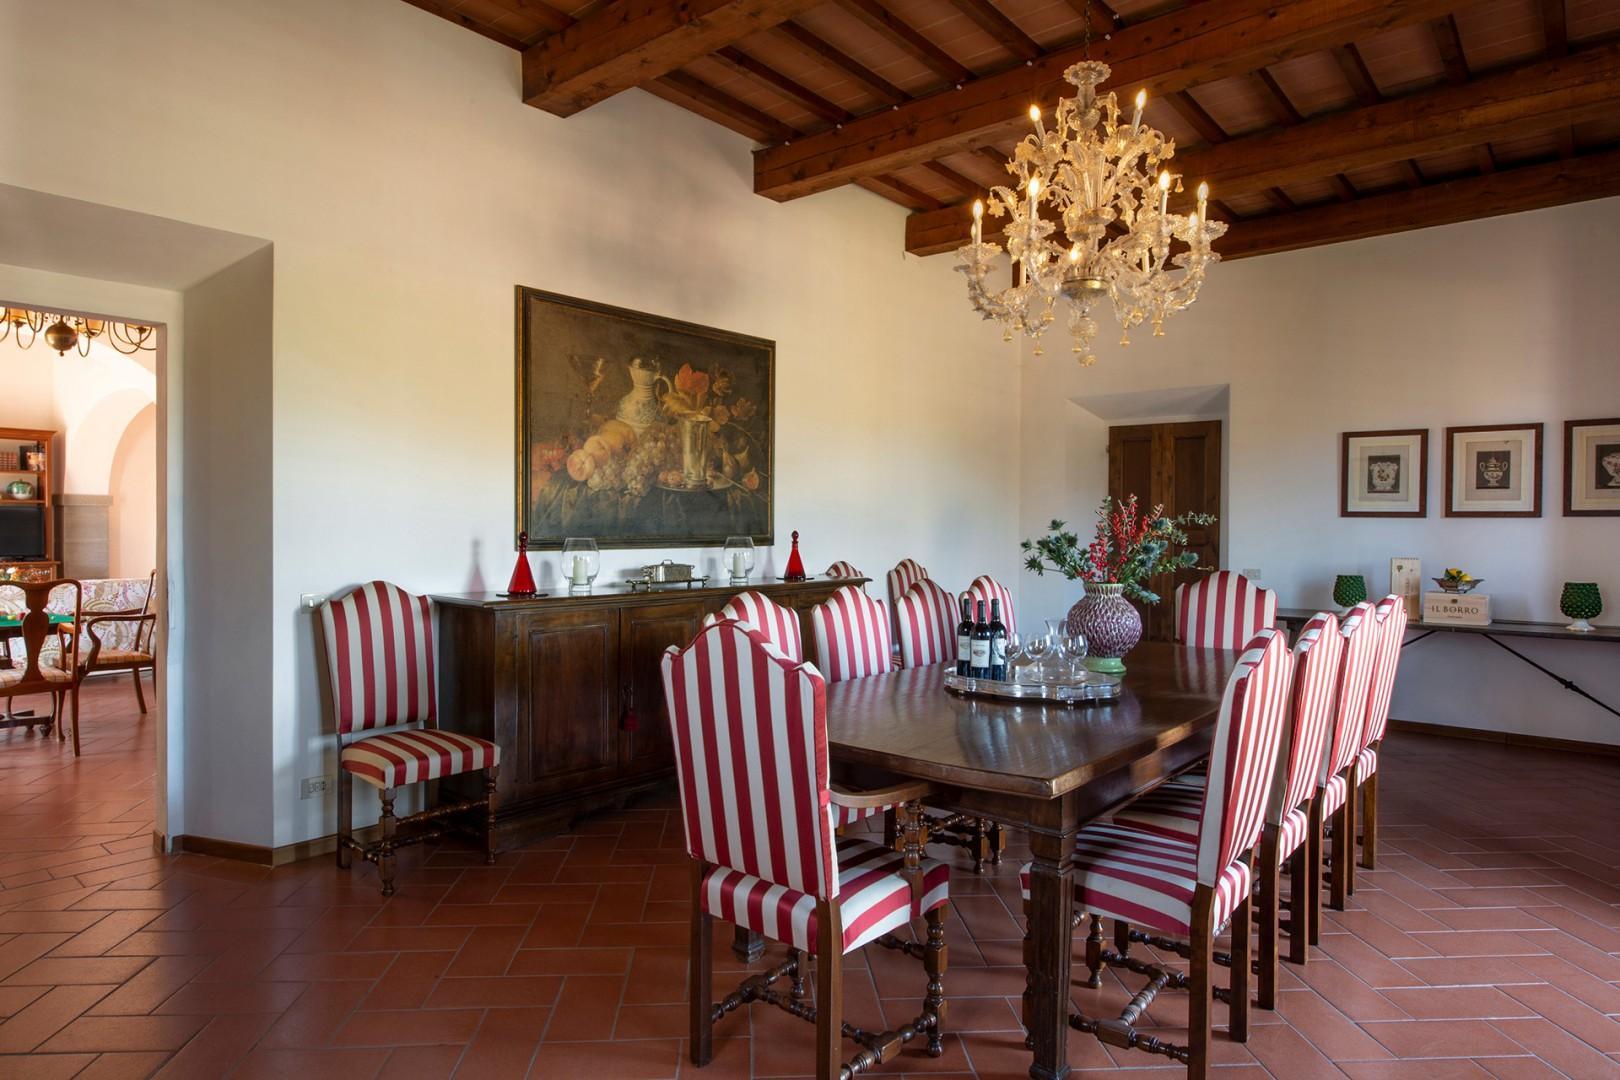 Elegant dining room seats 10.